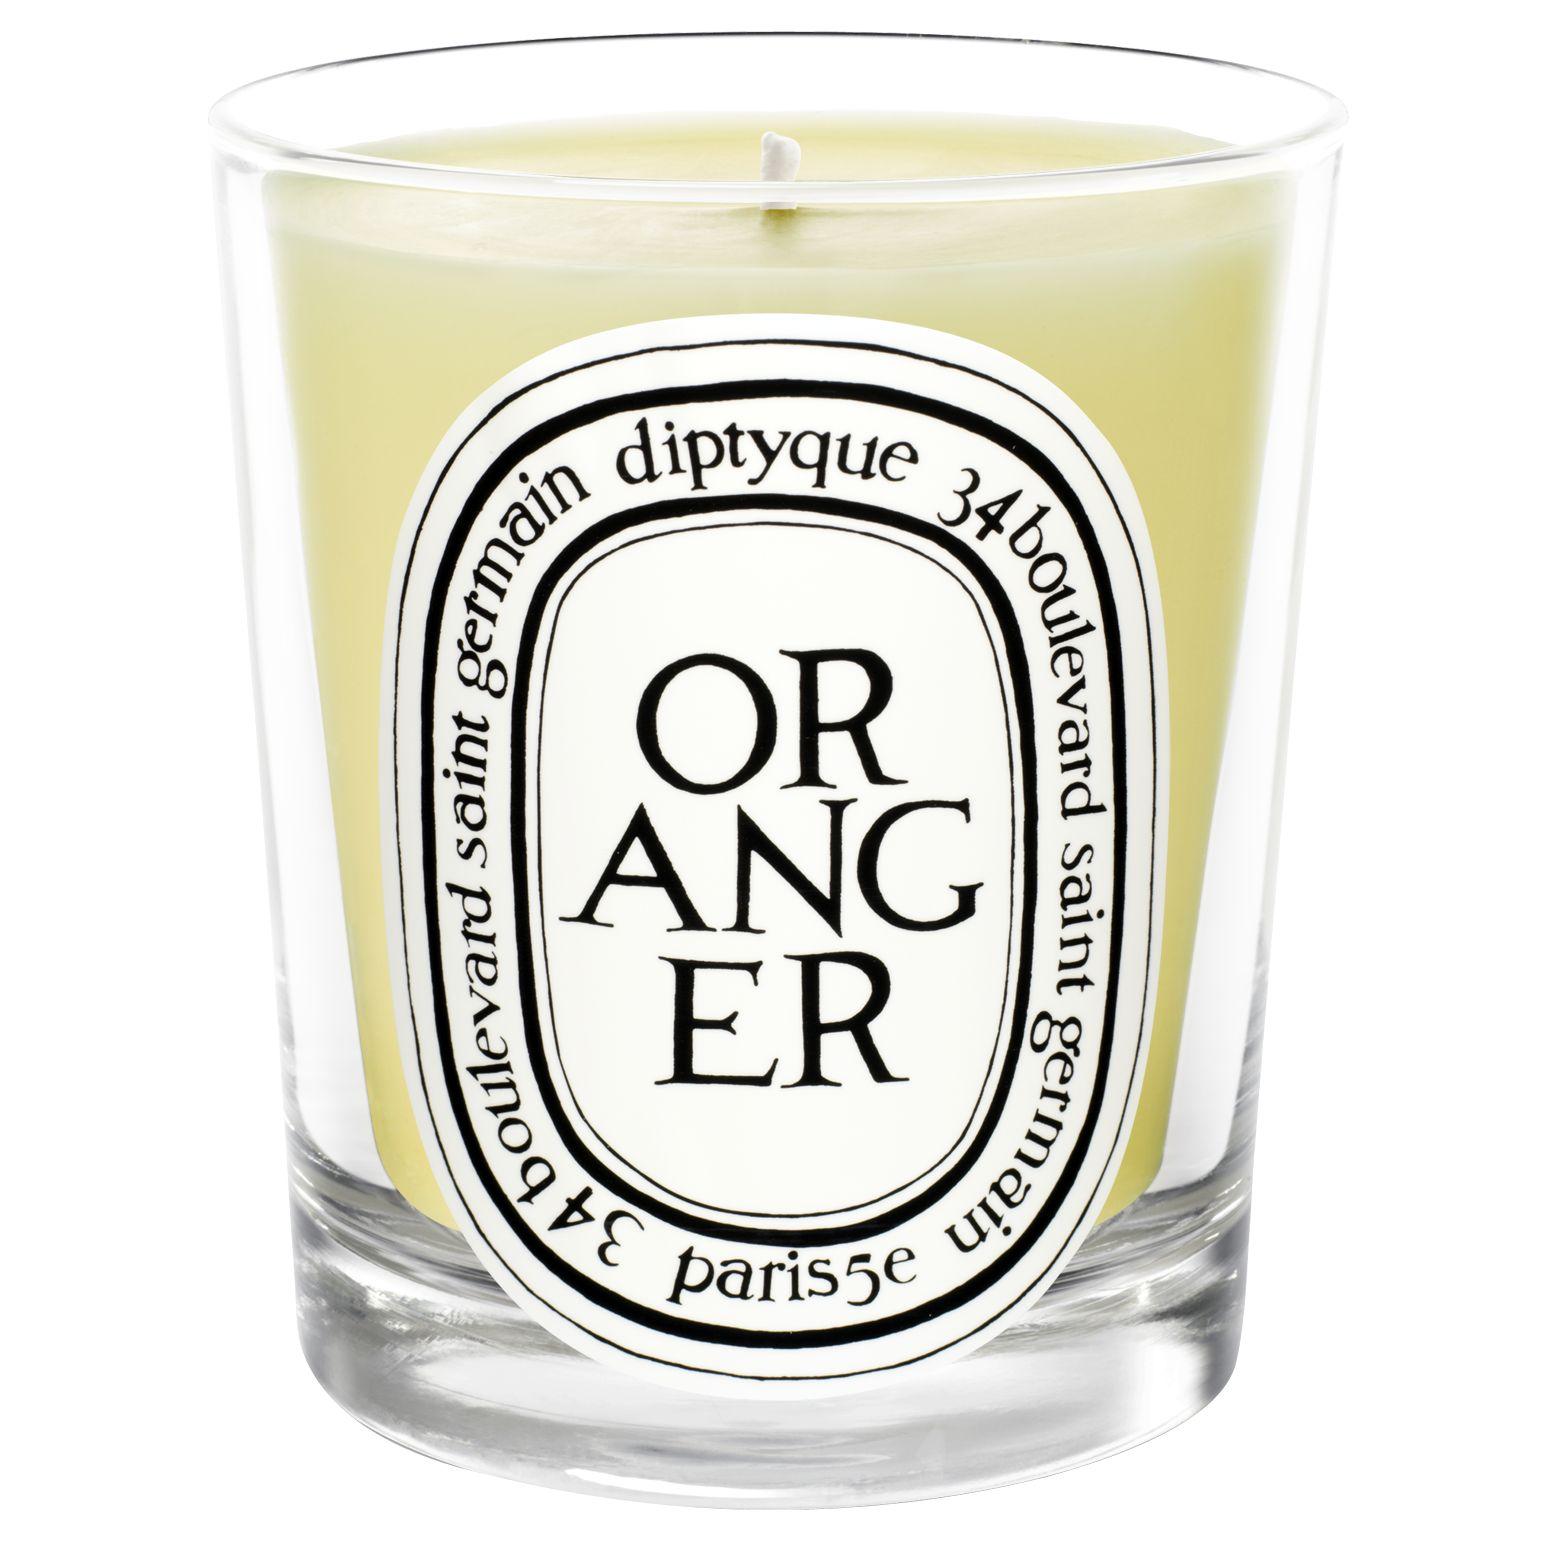 Diptyque Diptyque Oranger Scented Candle, 190g